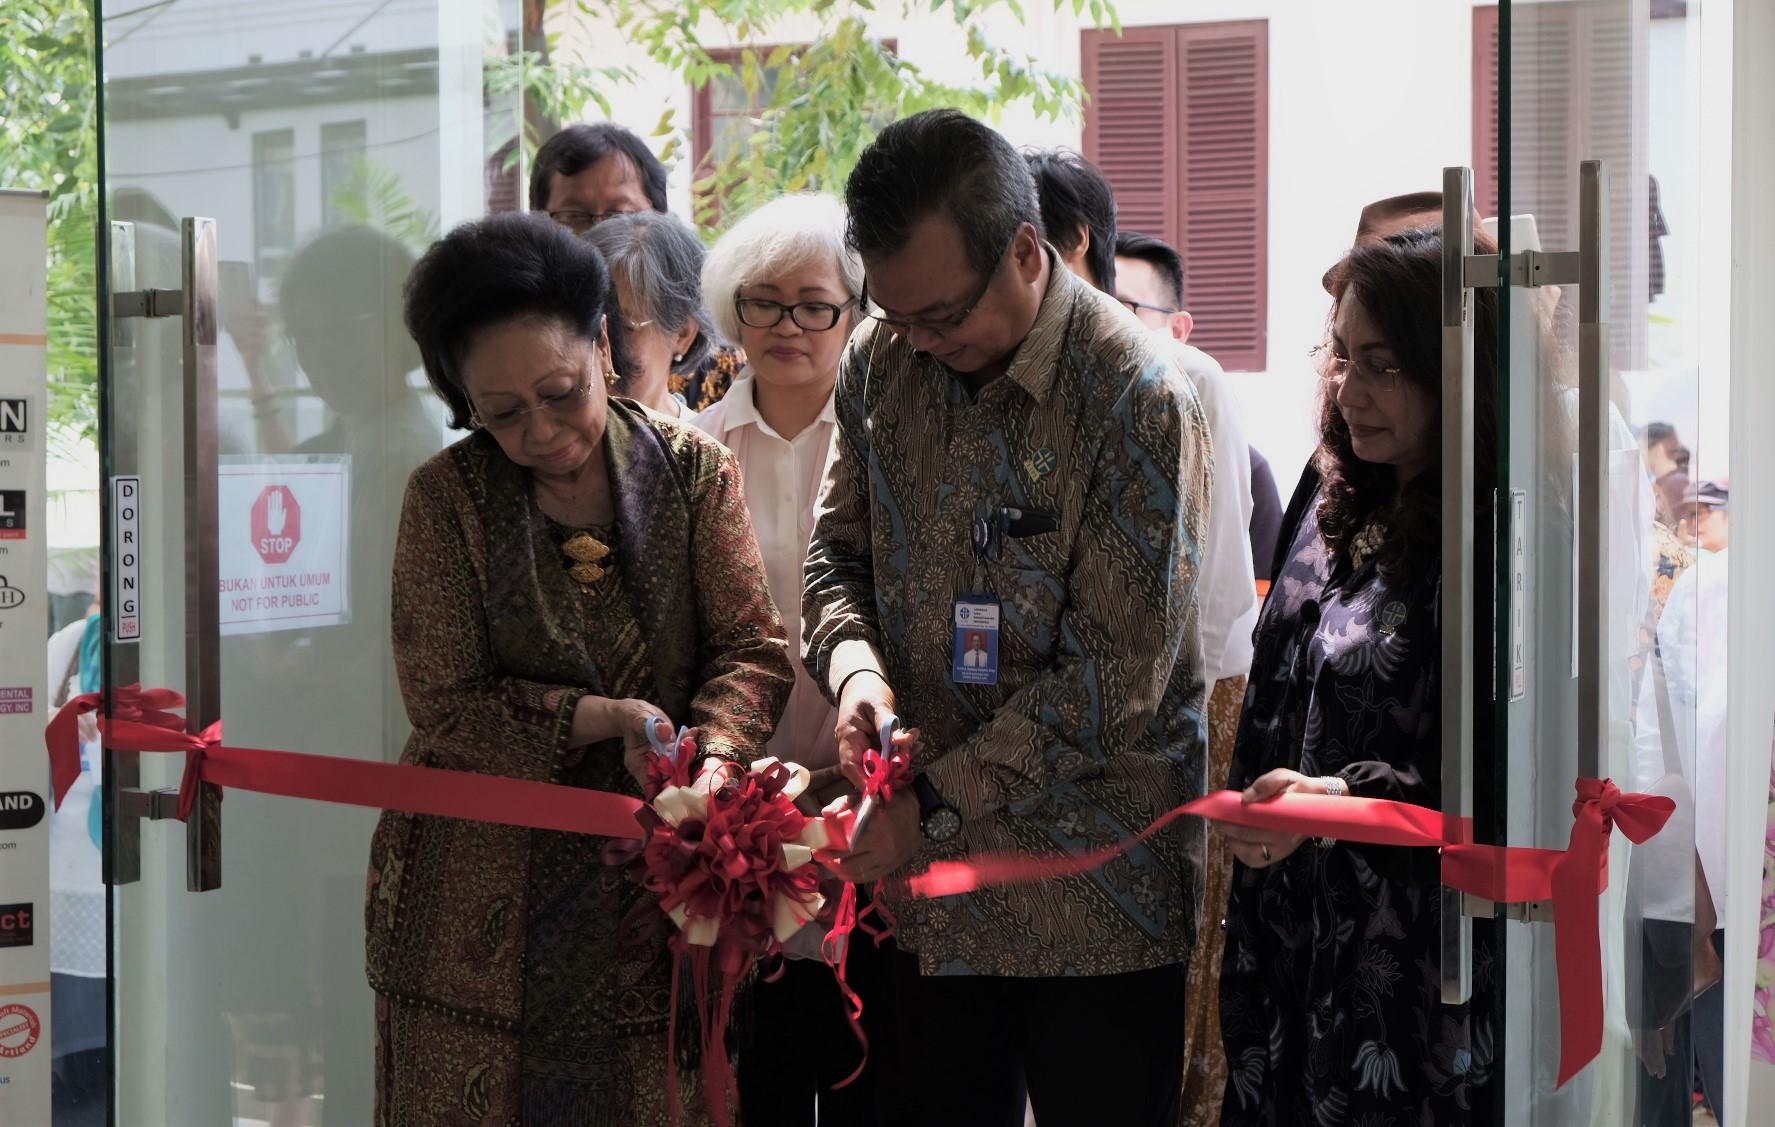 Pengguntingan pita oleh Plt. Kepala LIPI, Prof. Dr. Ir. Bambang Subiyanto, M.Agr. dan Dr. Martha Tilaar menandai pembukaan pameran Ragam Flora Indonesia